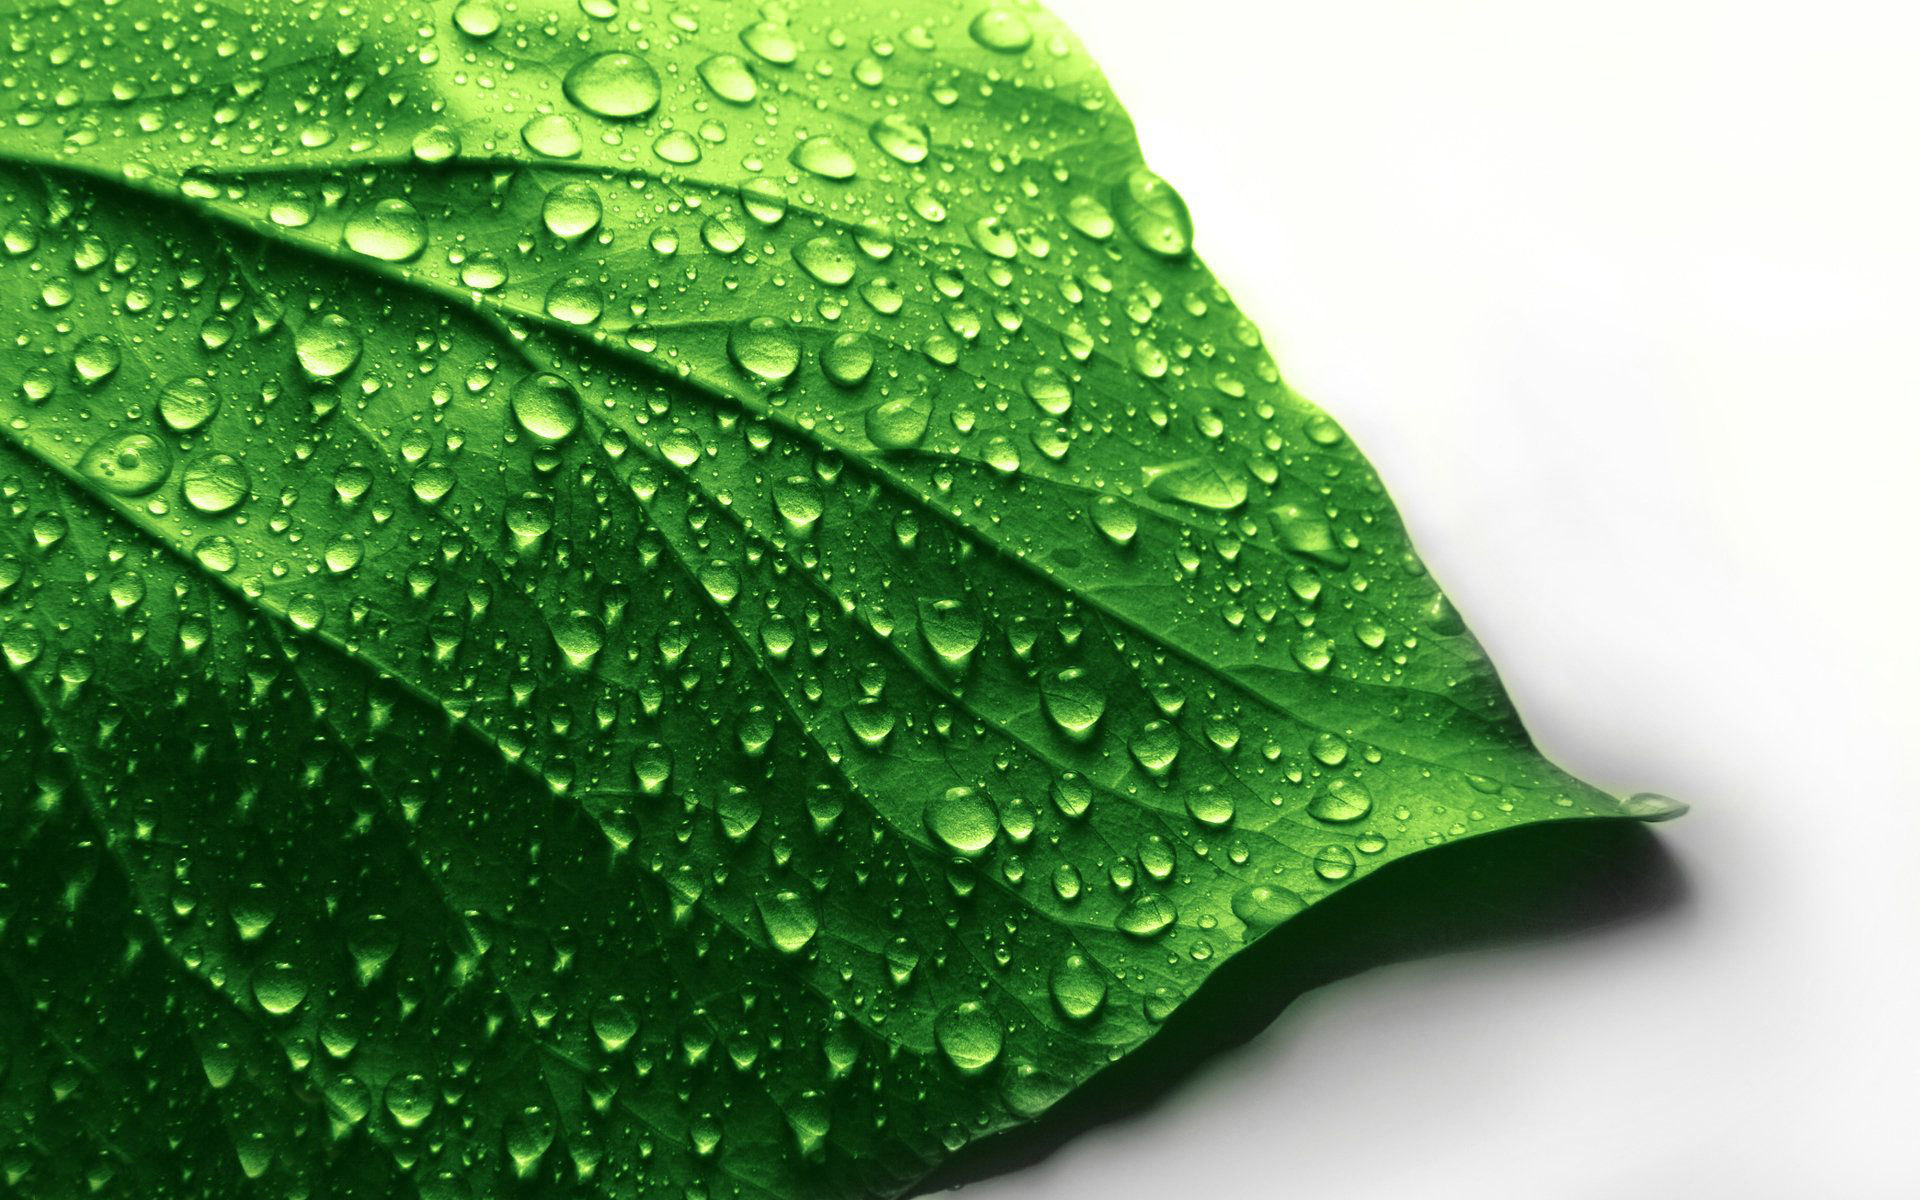 Autumn Leaves 3d Live Wallpaper Leaf Wallpaper Wet Hd Desktop Wallpapers 4k Hd